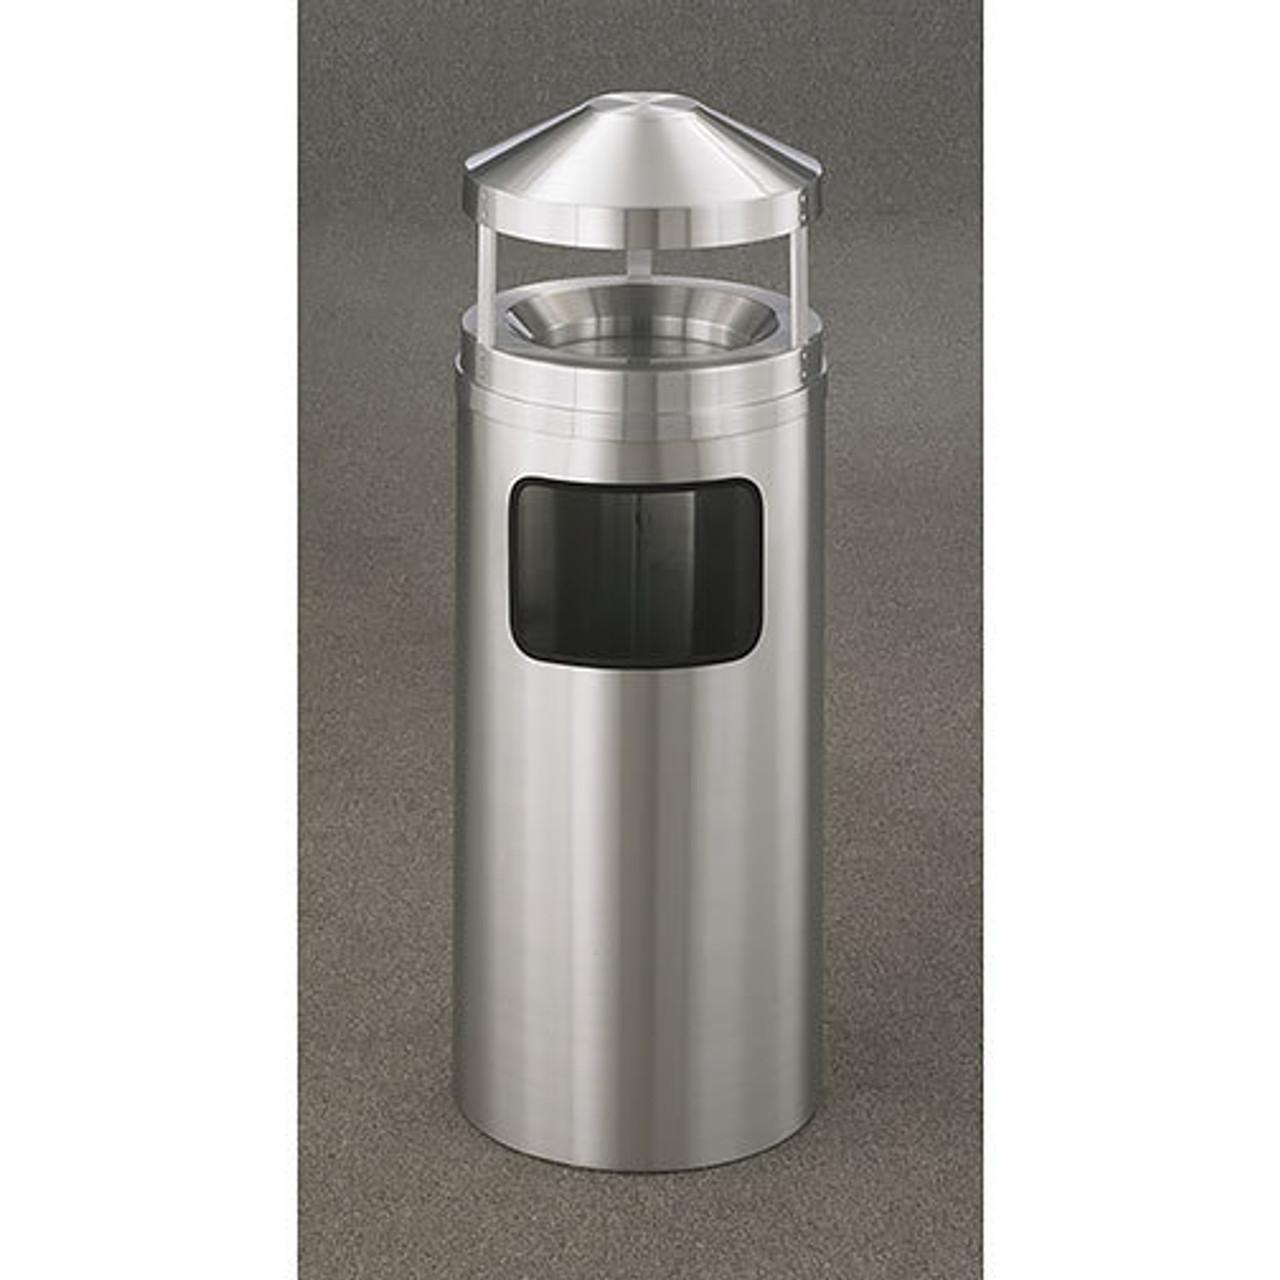 Glaro New Yorker Ash & Trash Cans